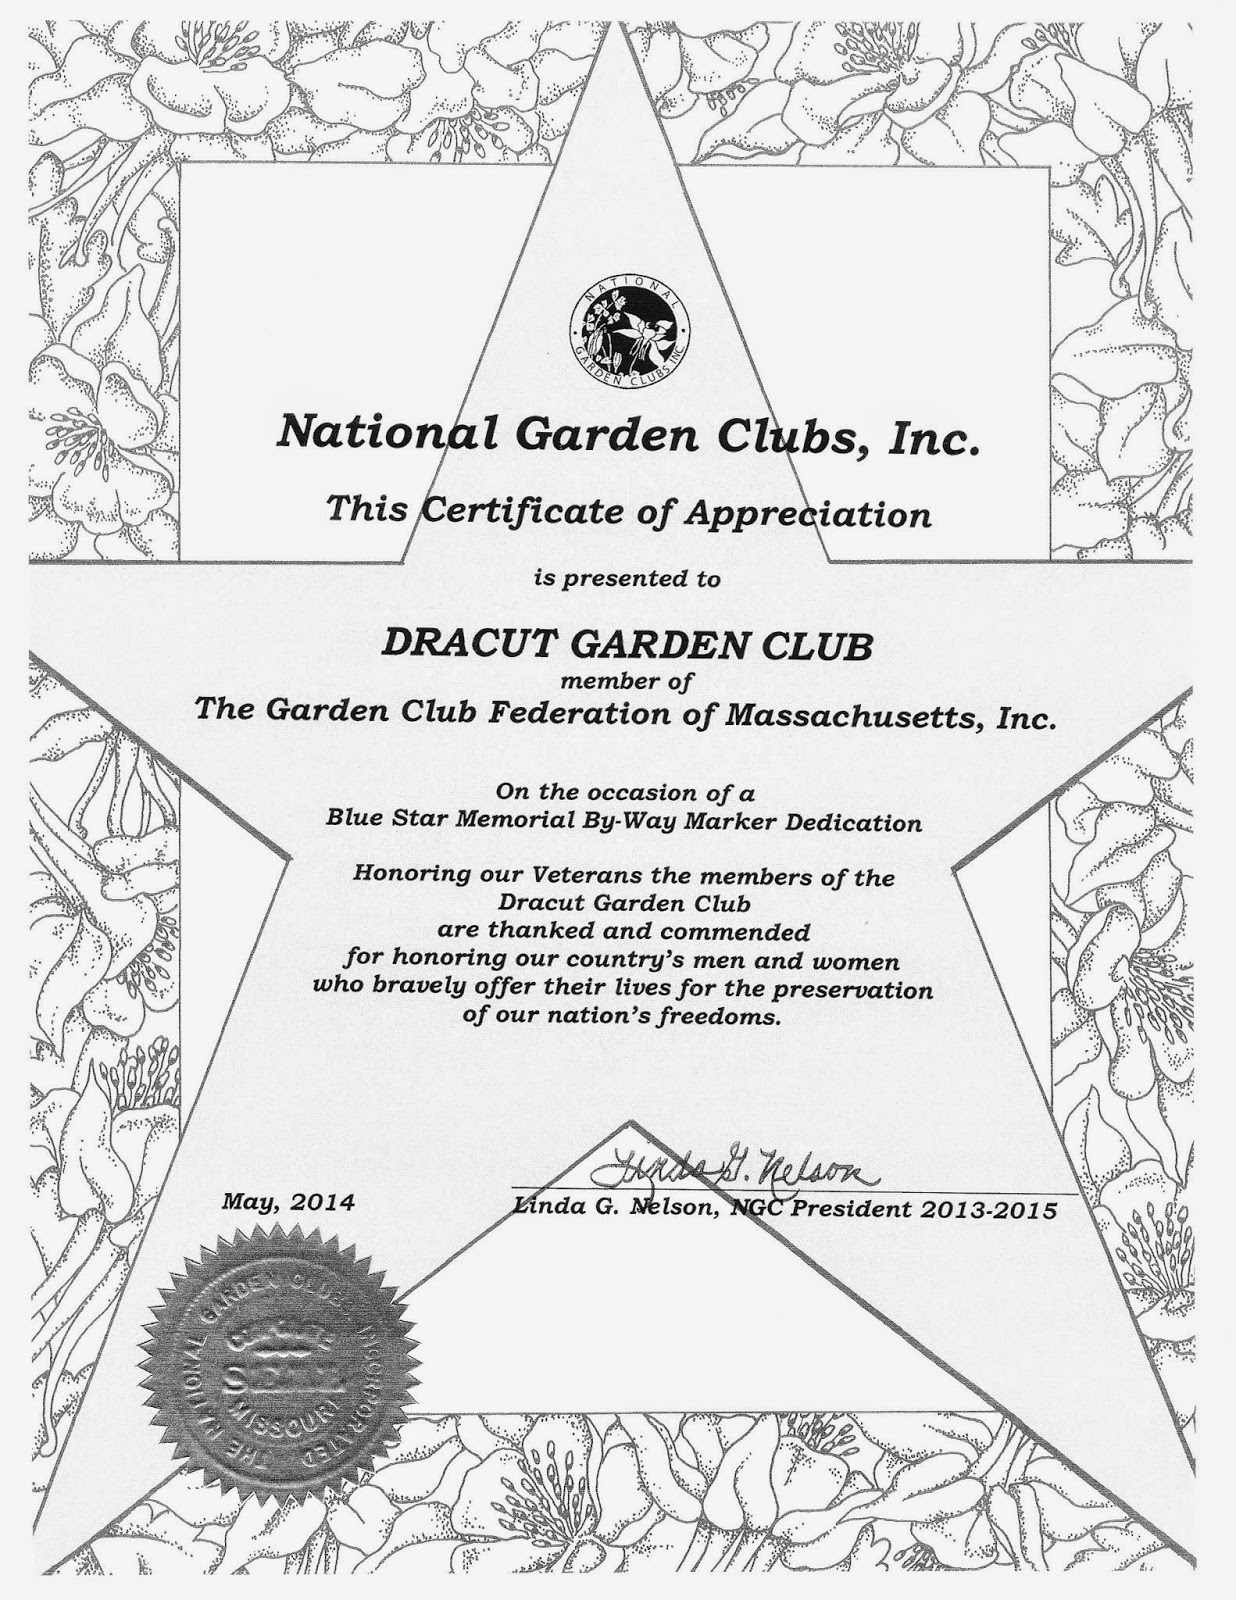 Dracut Garden Club: Awards